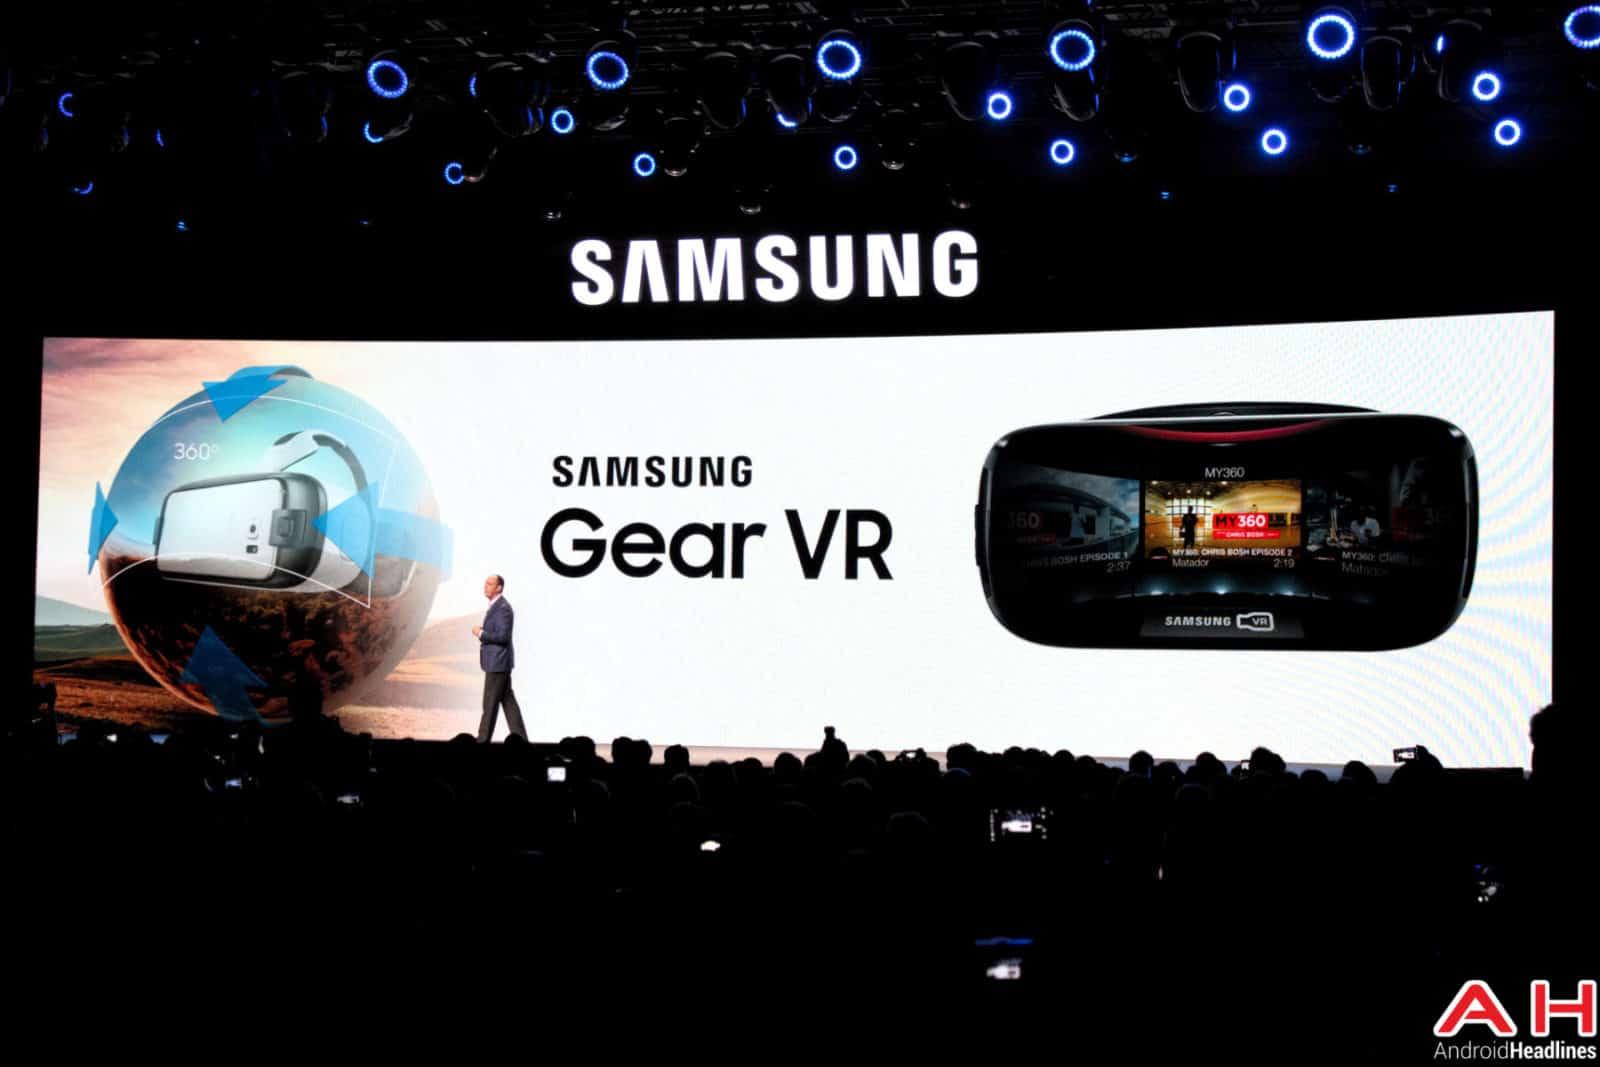 Samsung Gear VR CES AH-1